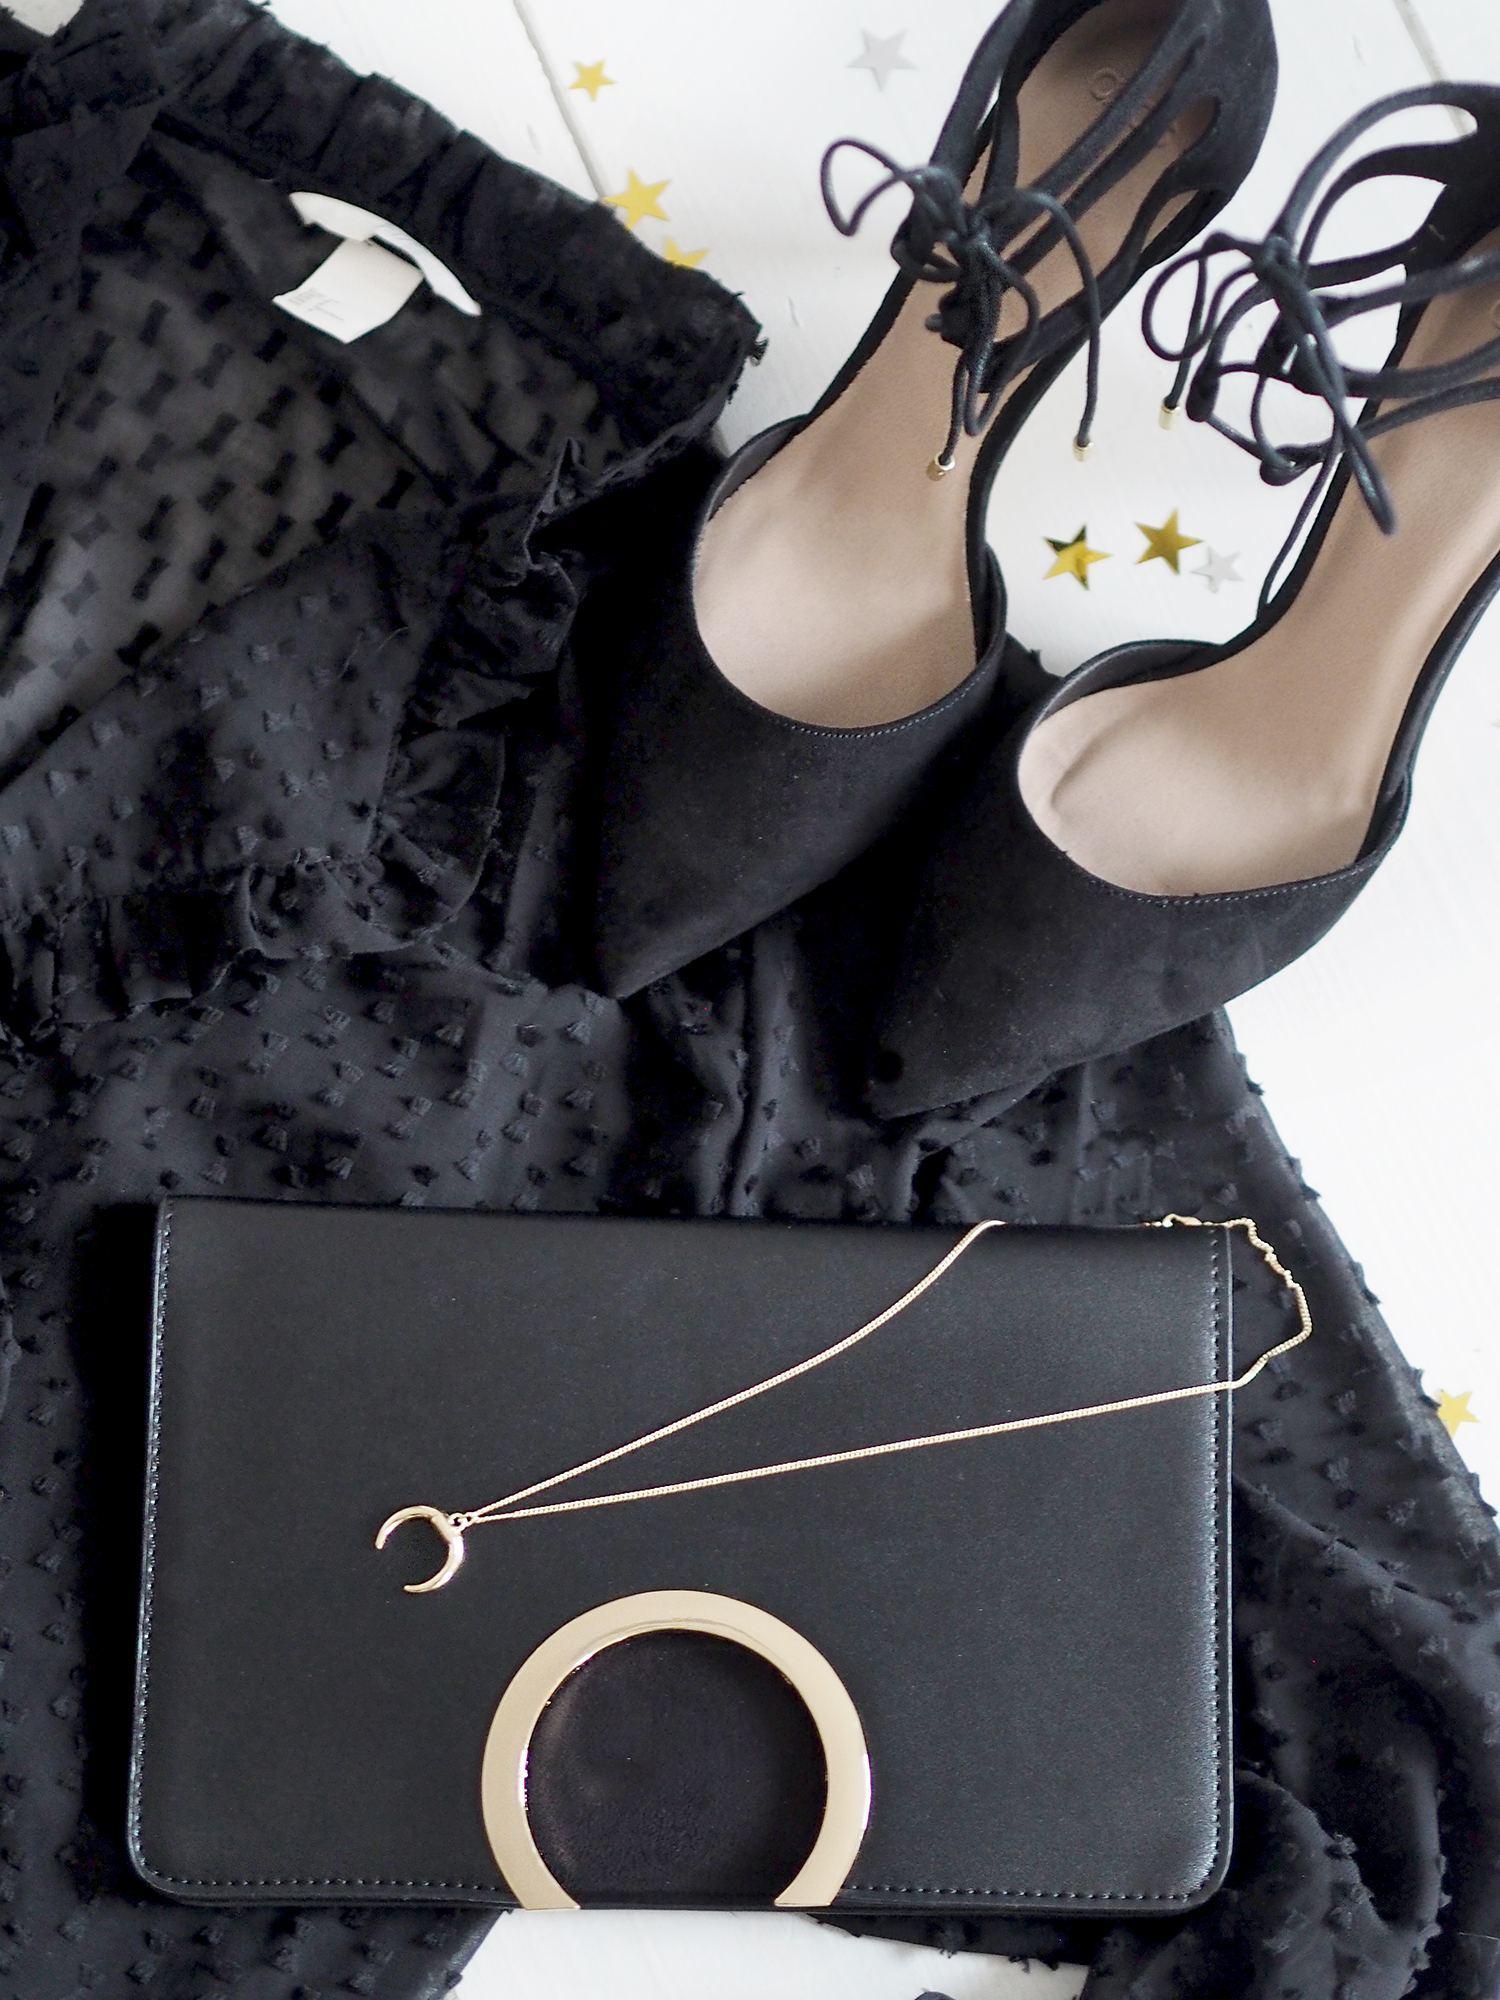 party heels and handbag christmas party